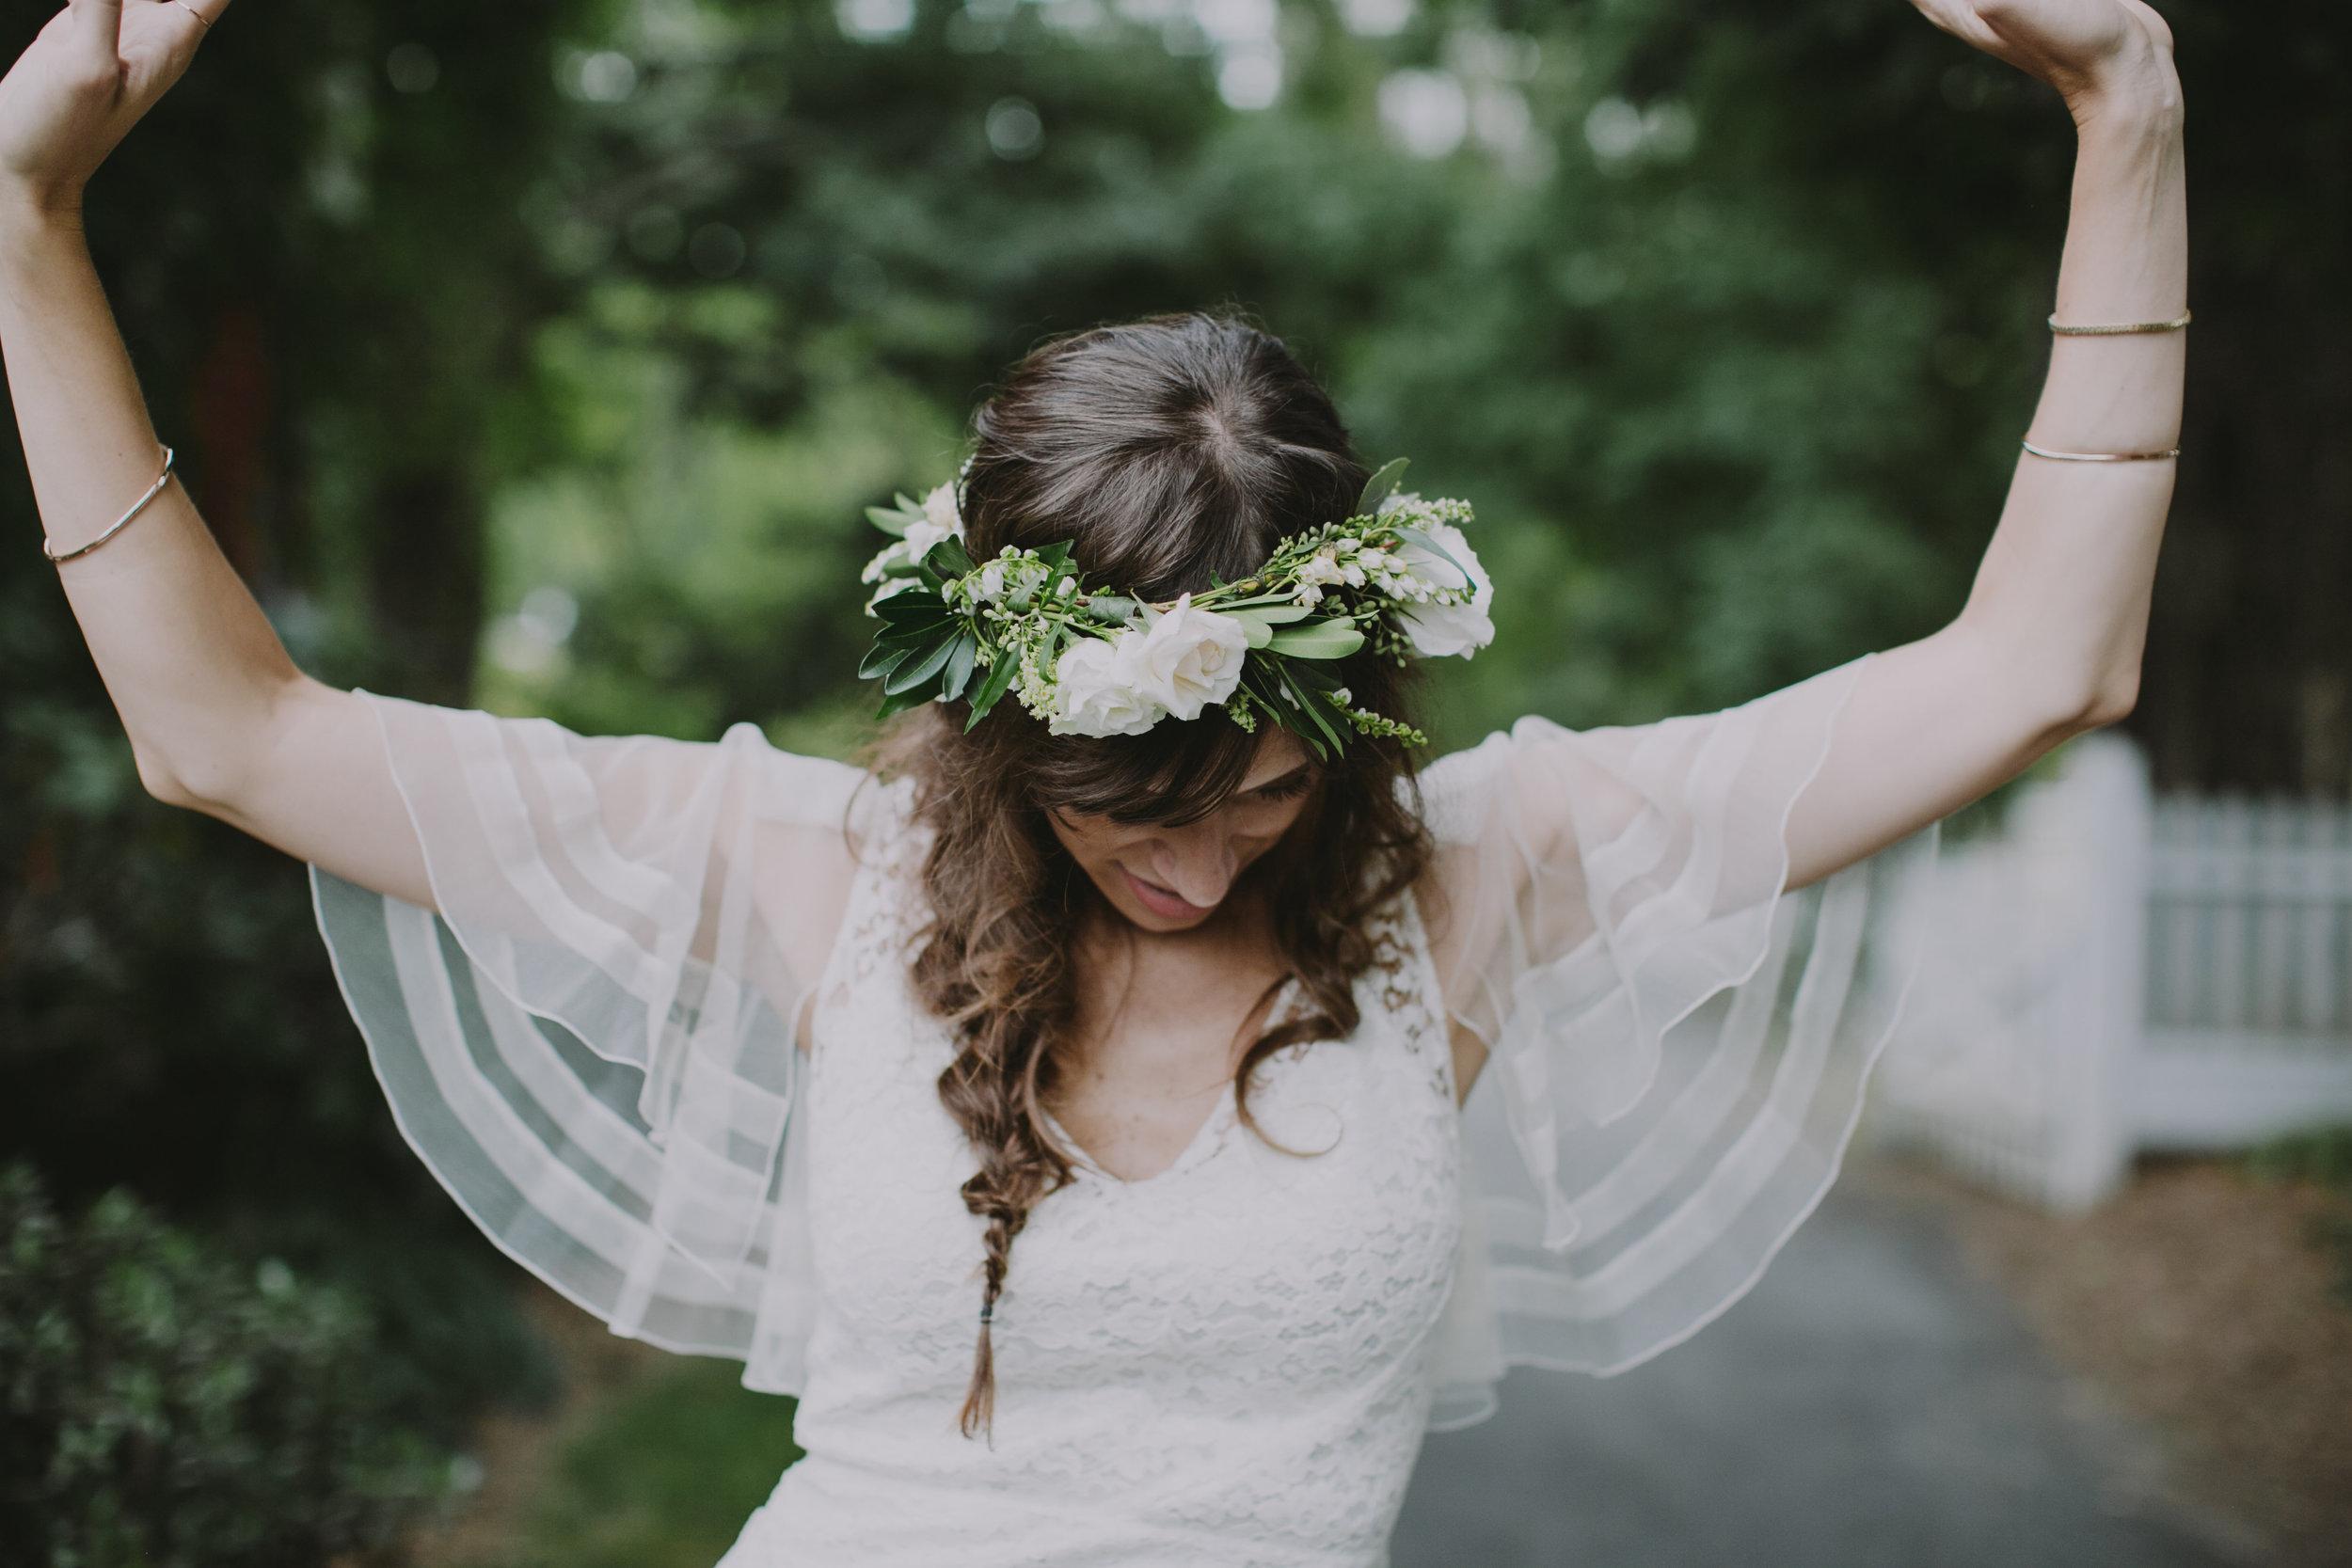 LIBERTY_VIEW_FARM_HIGHLAND_NY_WEDDING_CHELLISE_MICHAEL_PHOTOGRAPHY825.JPG